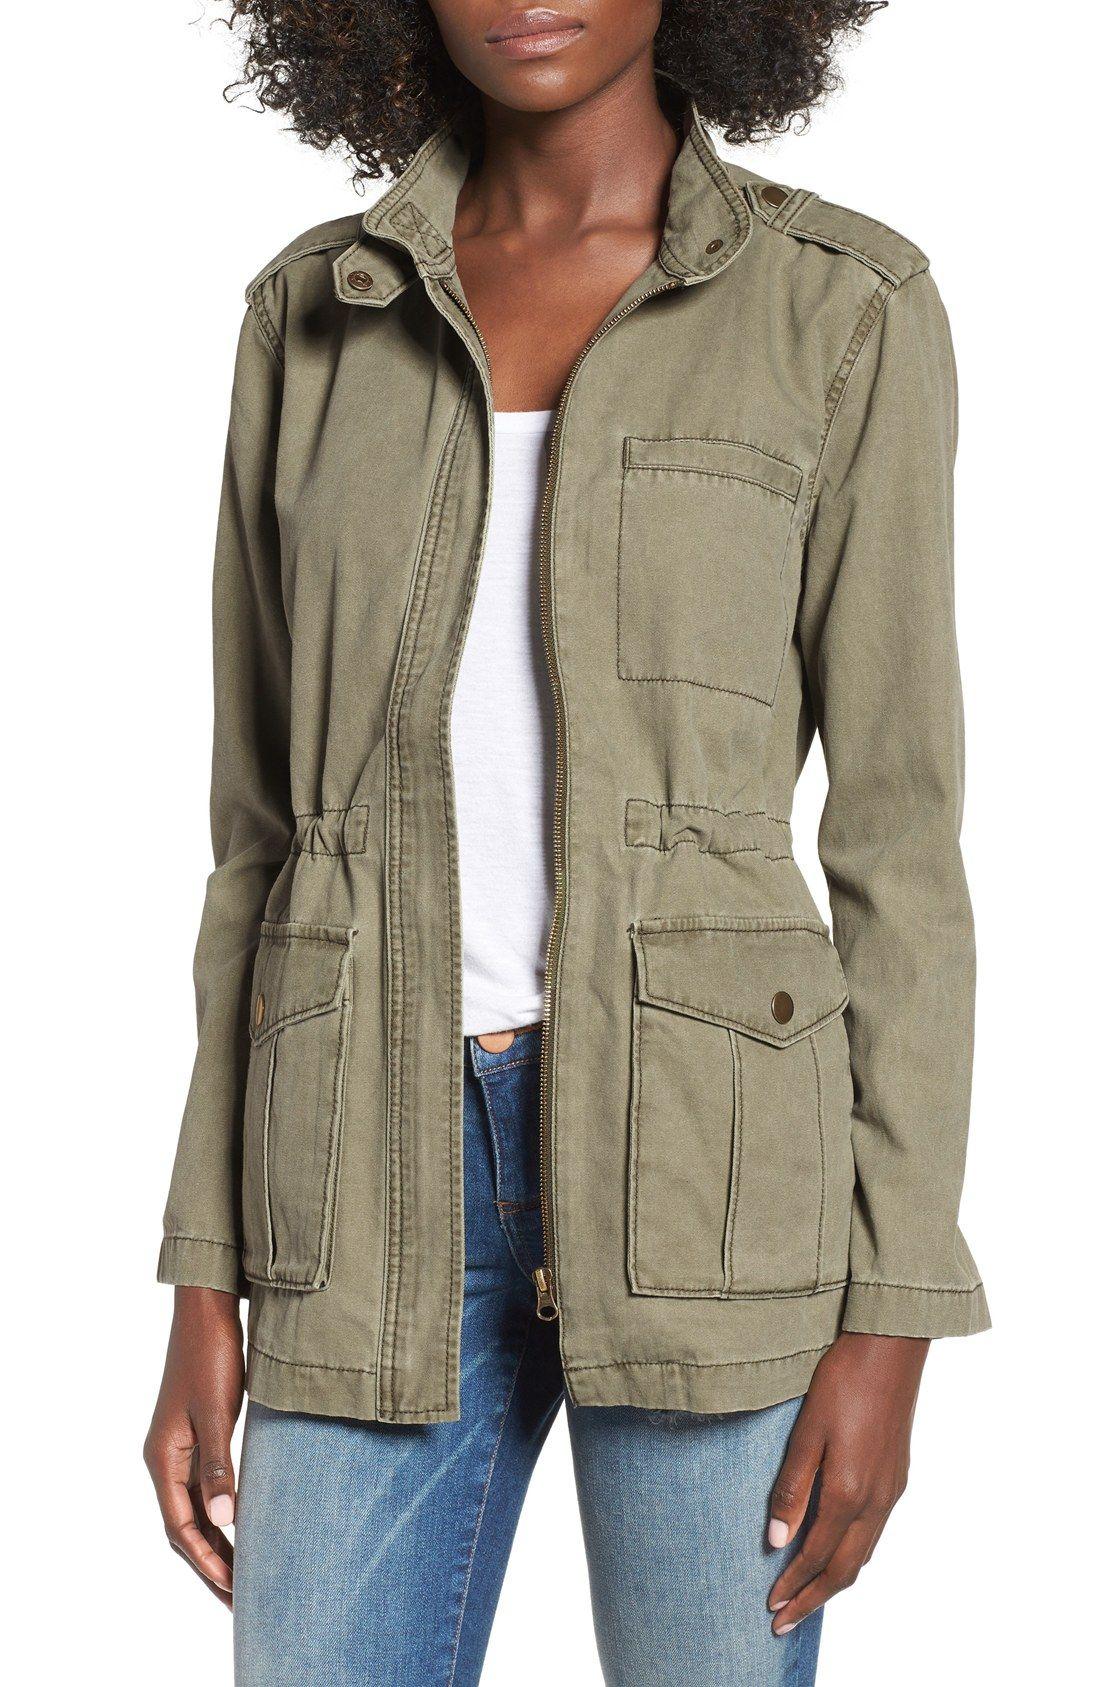 Fall Wardrobe Staple The Military Jacket The Golden Girl Stylish Jackets Anorak Madewell Fleet Jacket [ 1687 x 1100 Pixel ]